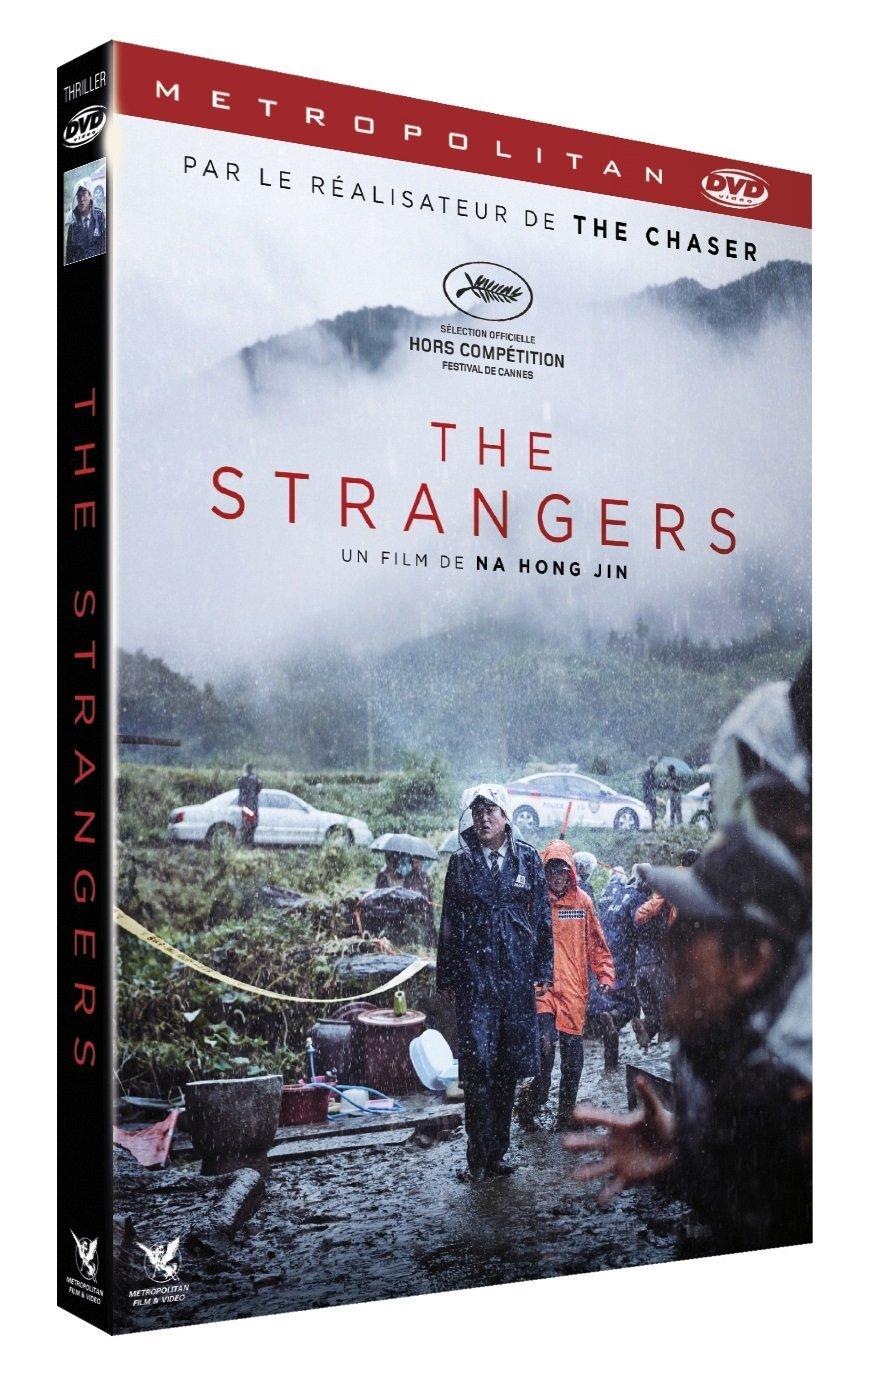 sortie en dvd et blu ray du film the strangers 09 janvier 2017 manga news. Black Bedroom Furniture Sets. Home Design Ideas